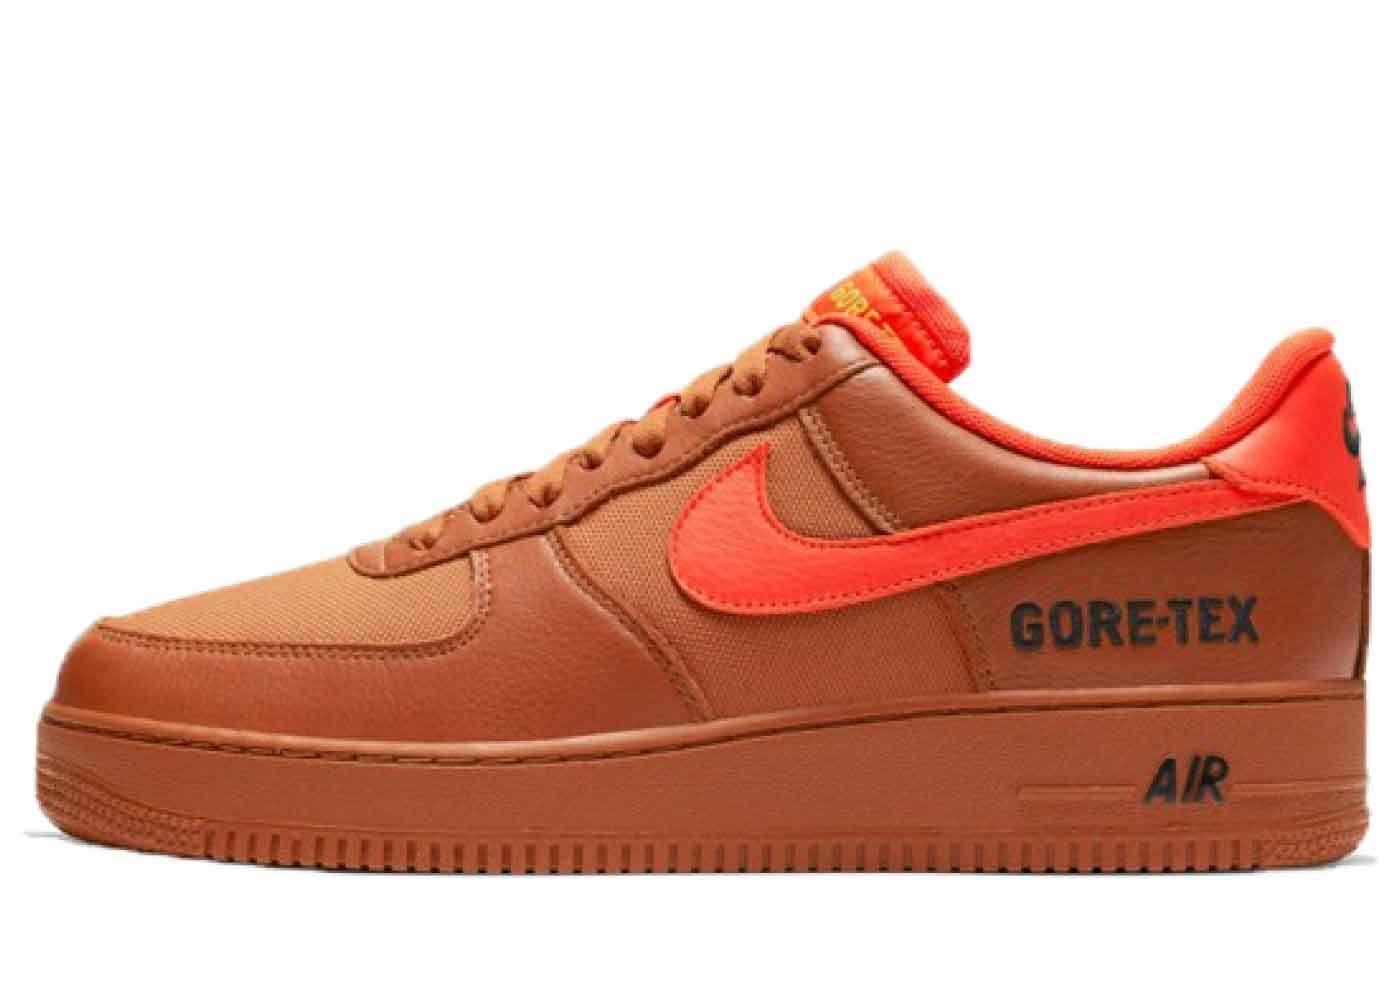 Nike Air Force 1 Low Gore-Tex Burnt Orangeの写真